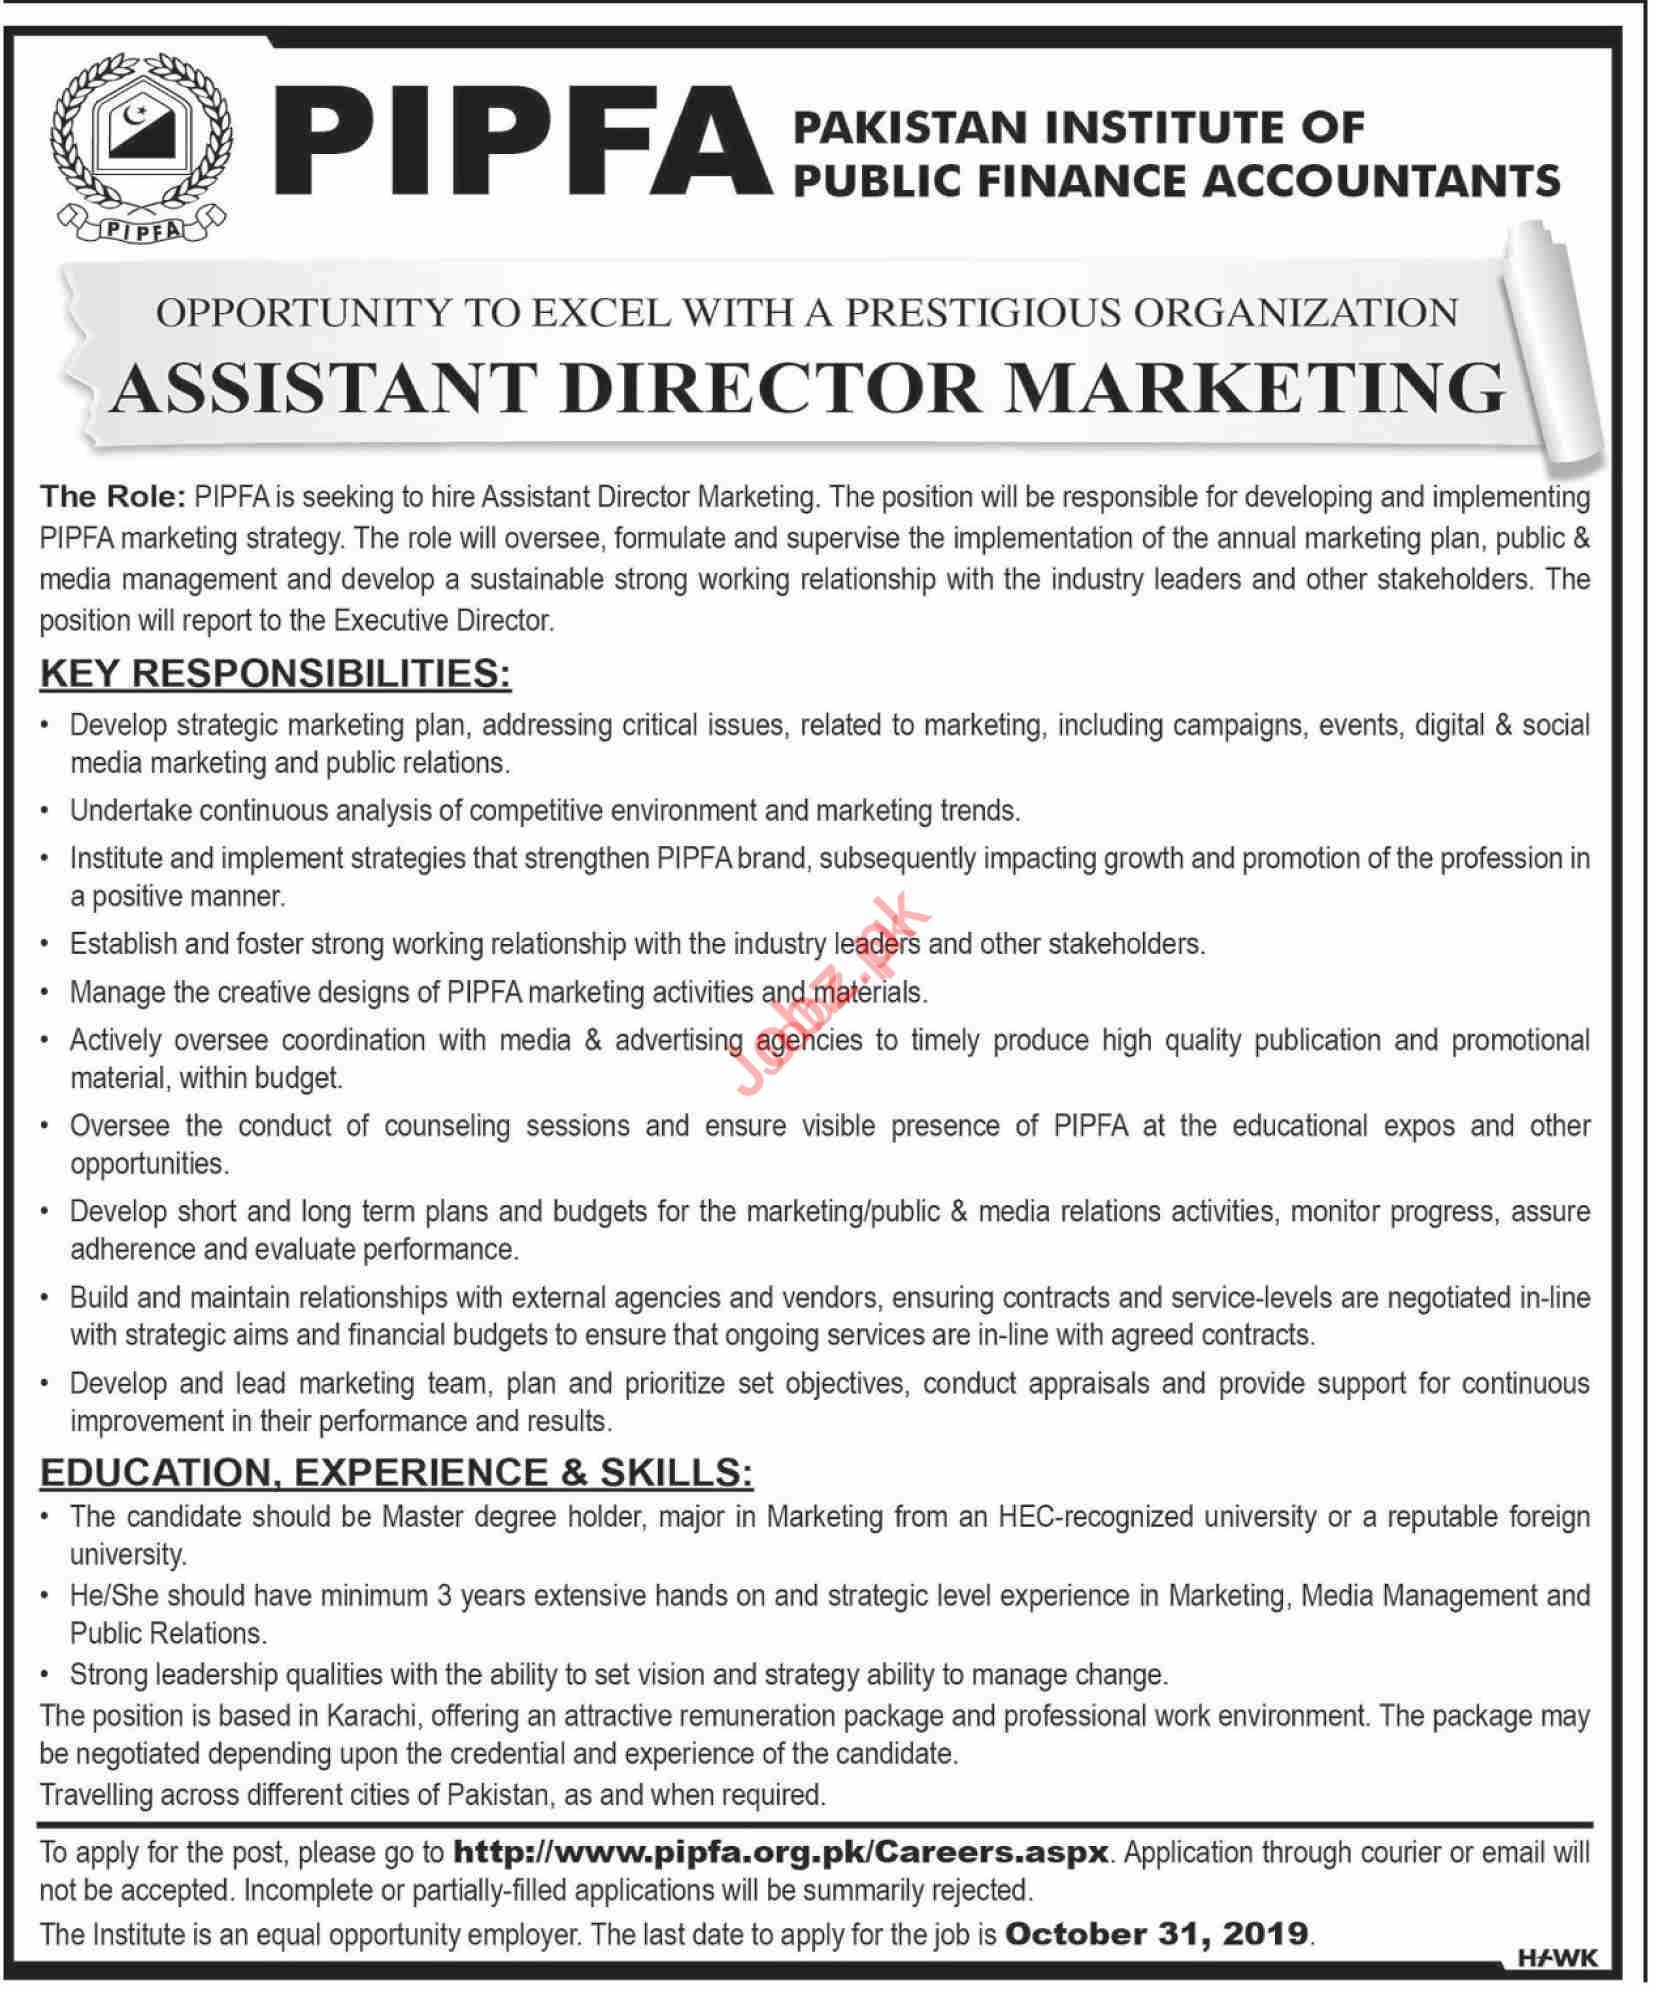 Pakistan Institute of Public Finance Accountants PIPFA Job